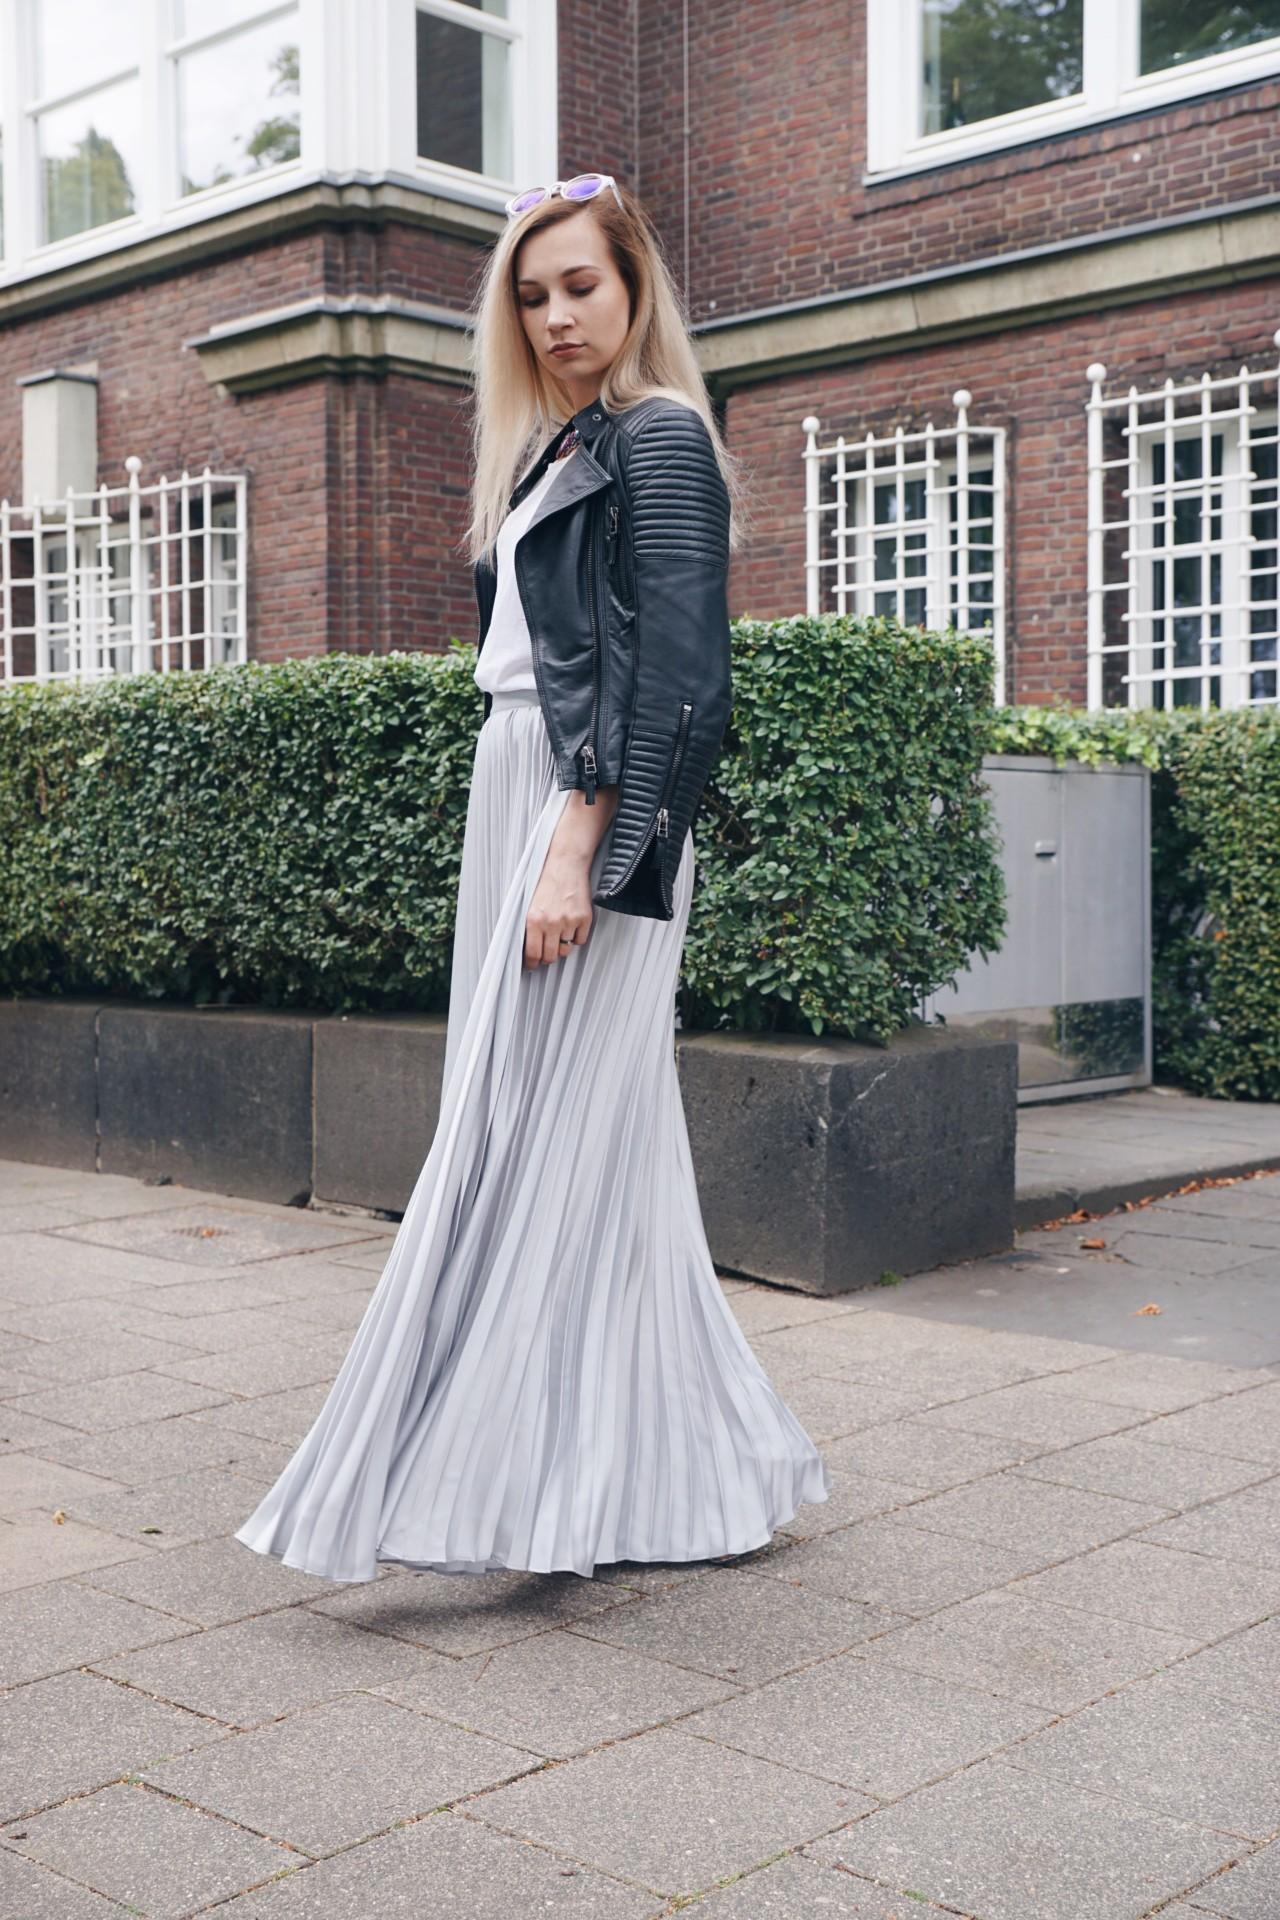 streetstyle_fashion_dbkstylez_pleated_falltrends_мода_тренды_фэшн